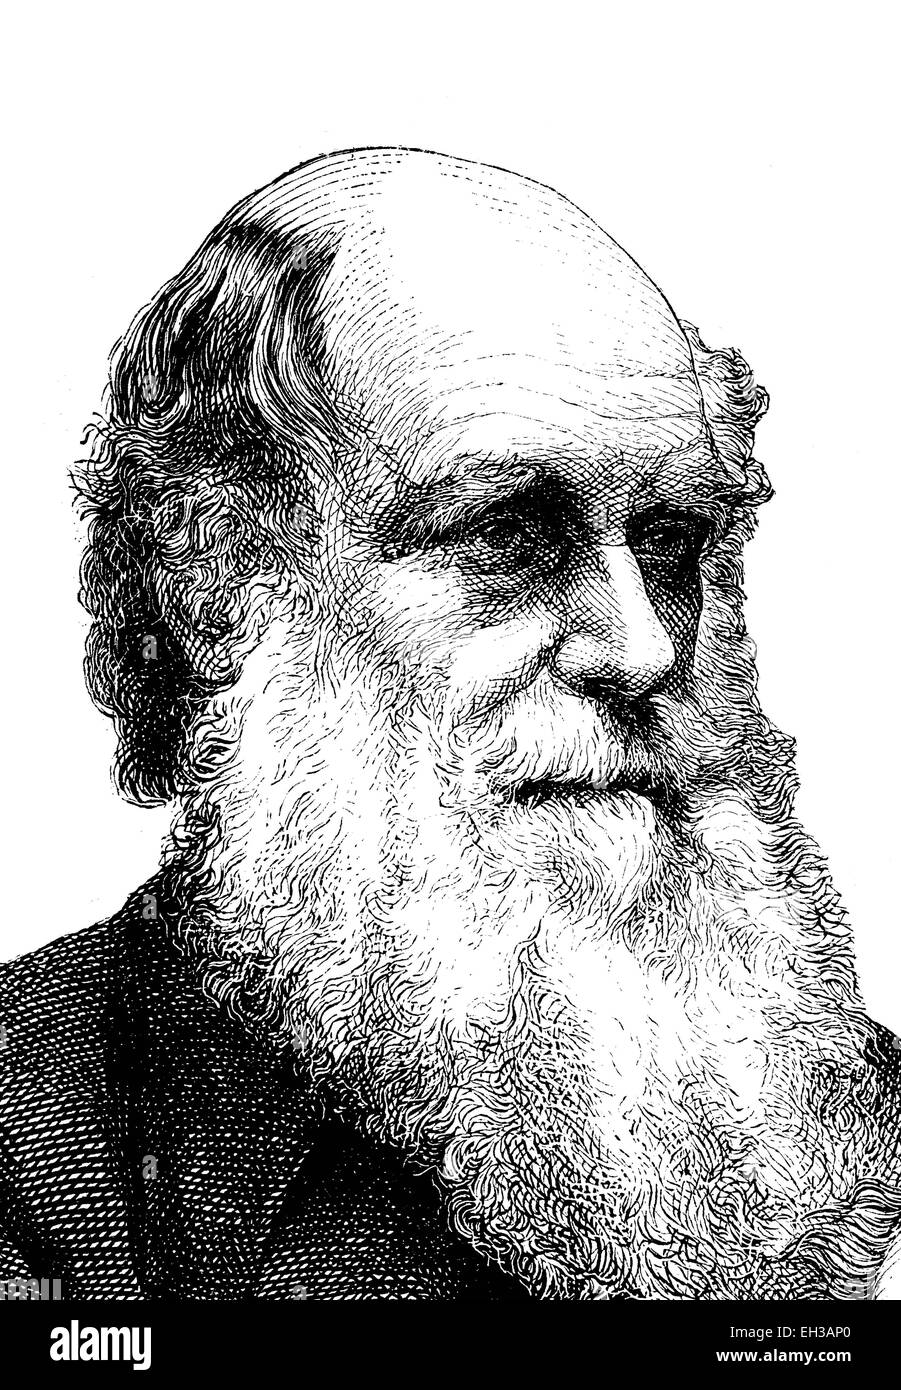 Charles Robert Darwin, 1809 - 1882, British naturalist, wood engraving, 1880 - Stock Image